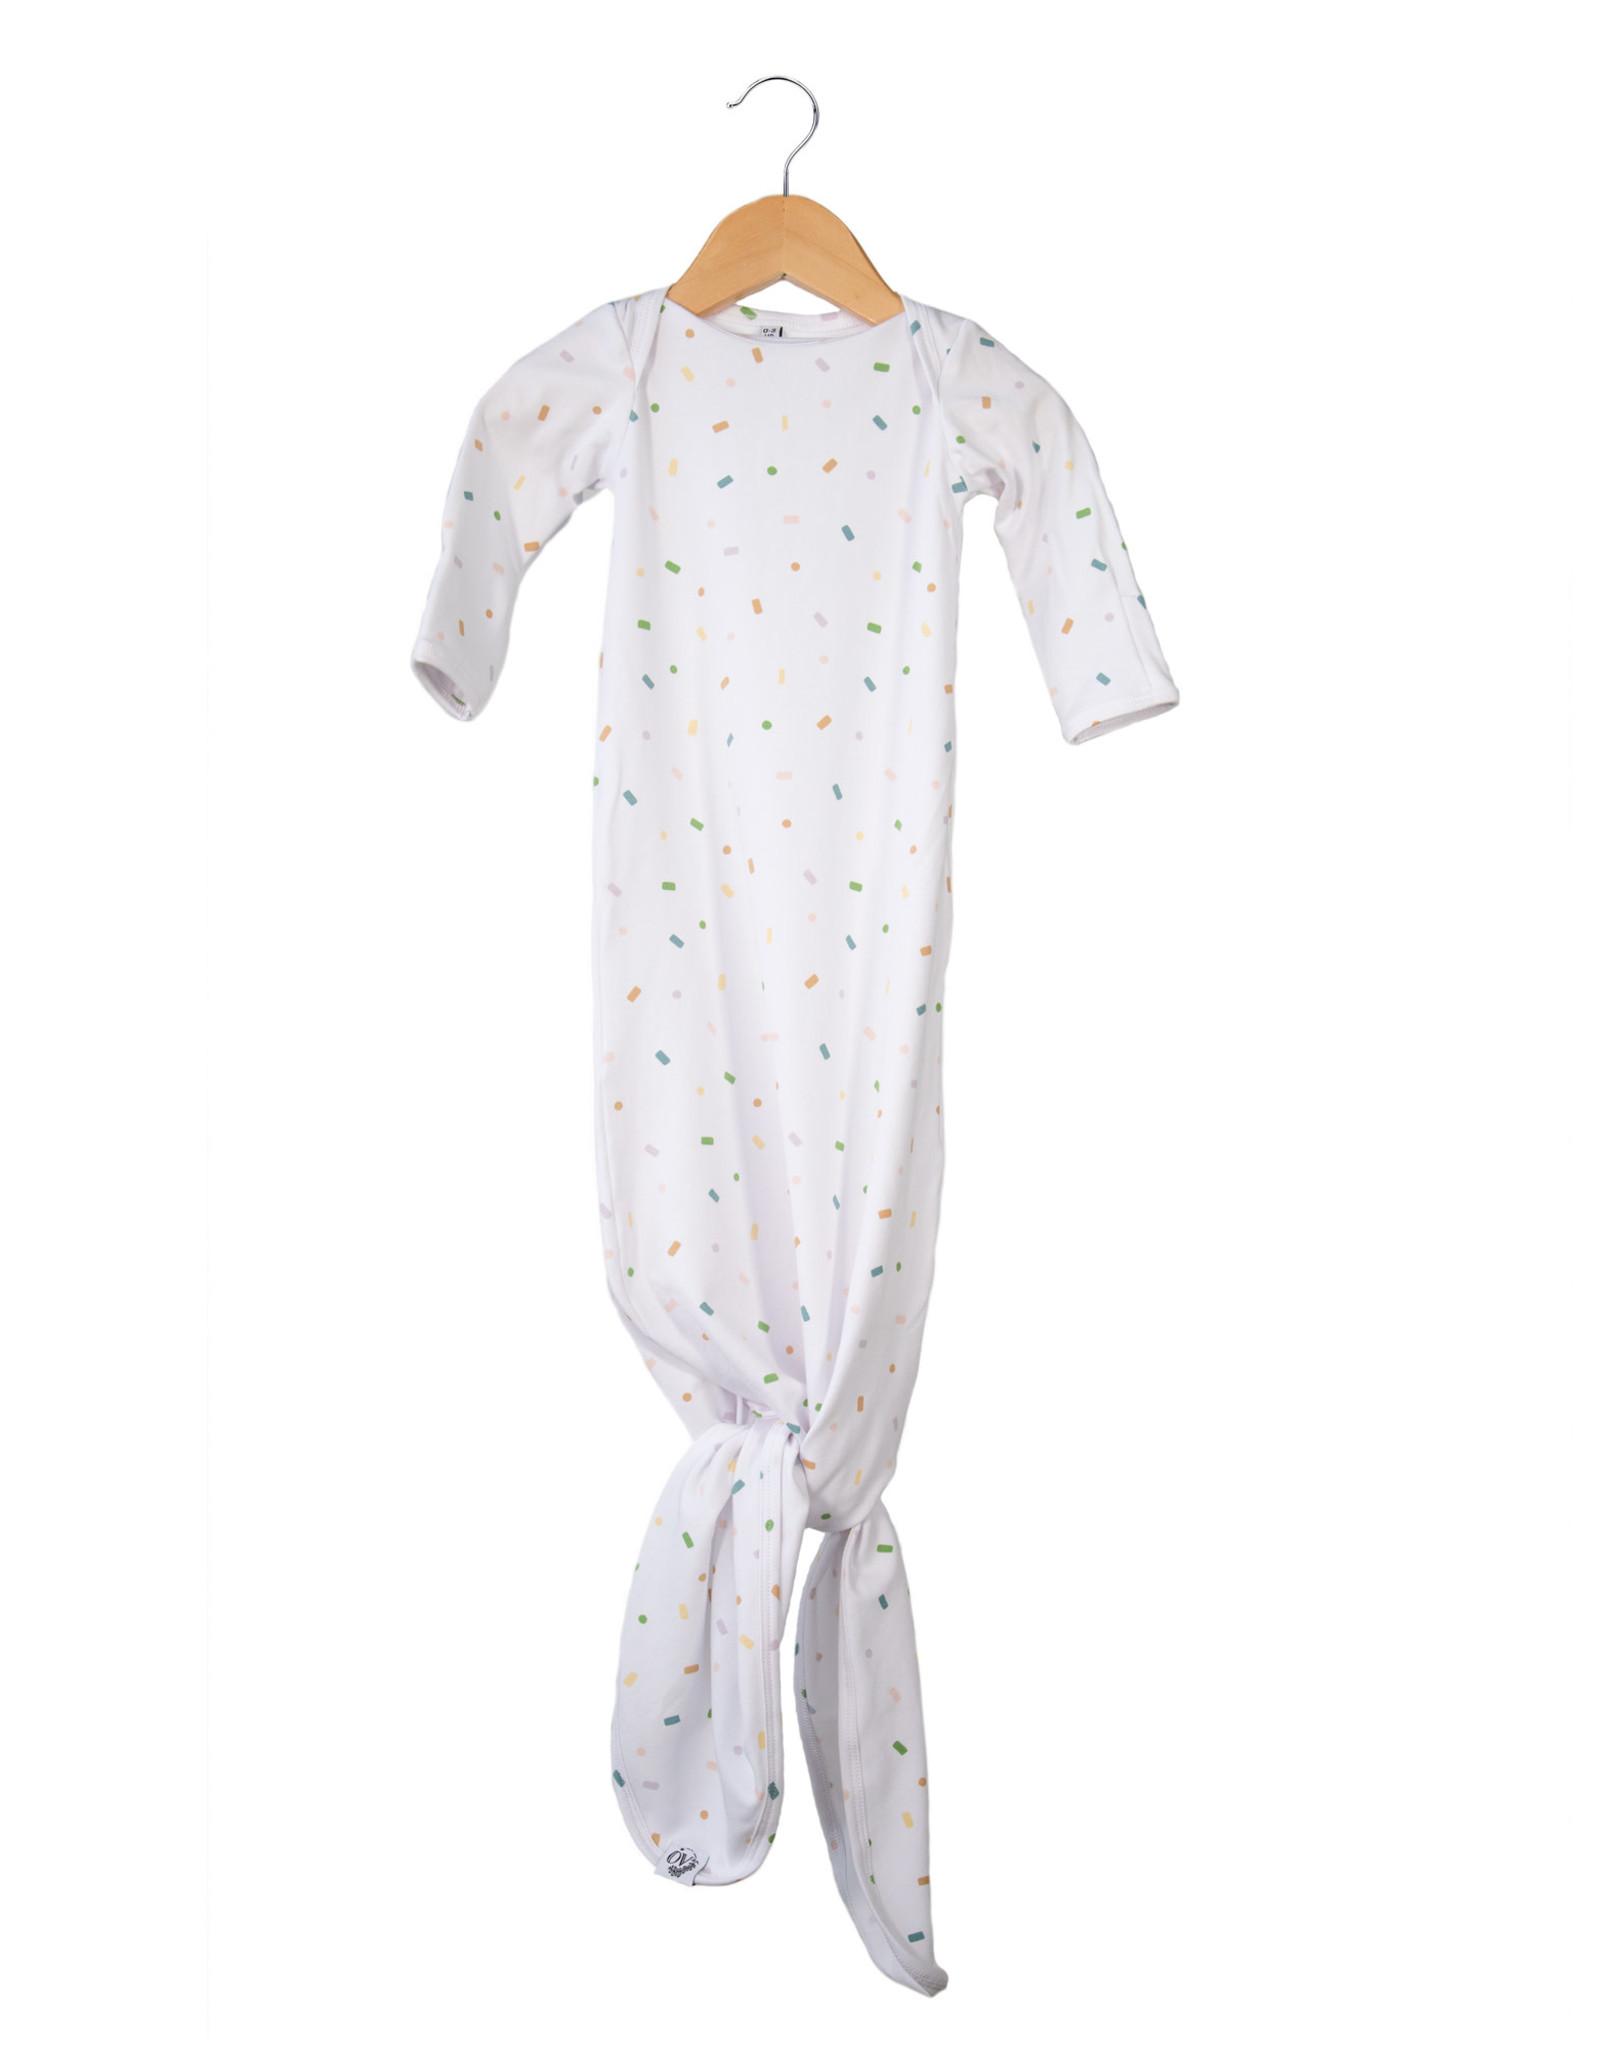 The Over Company The OVer Company Nodo Gown - Joy - Newborn